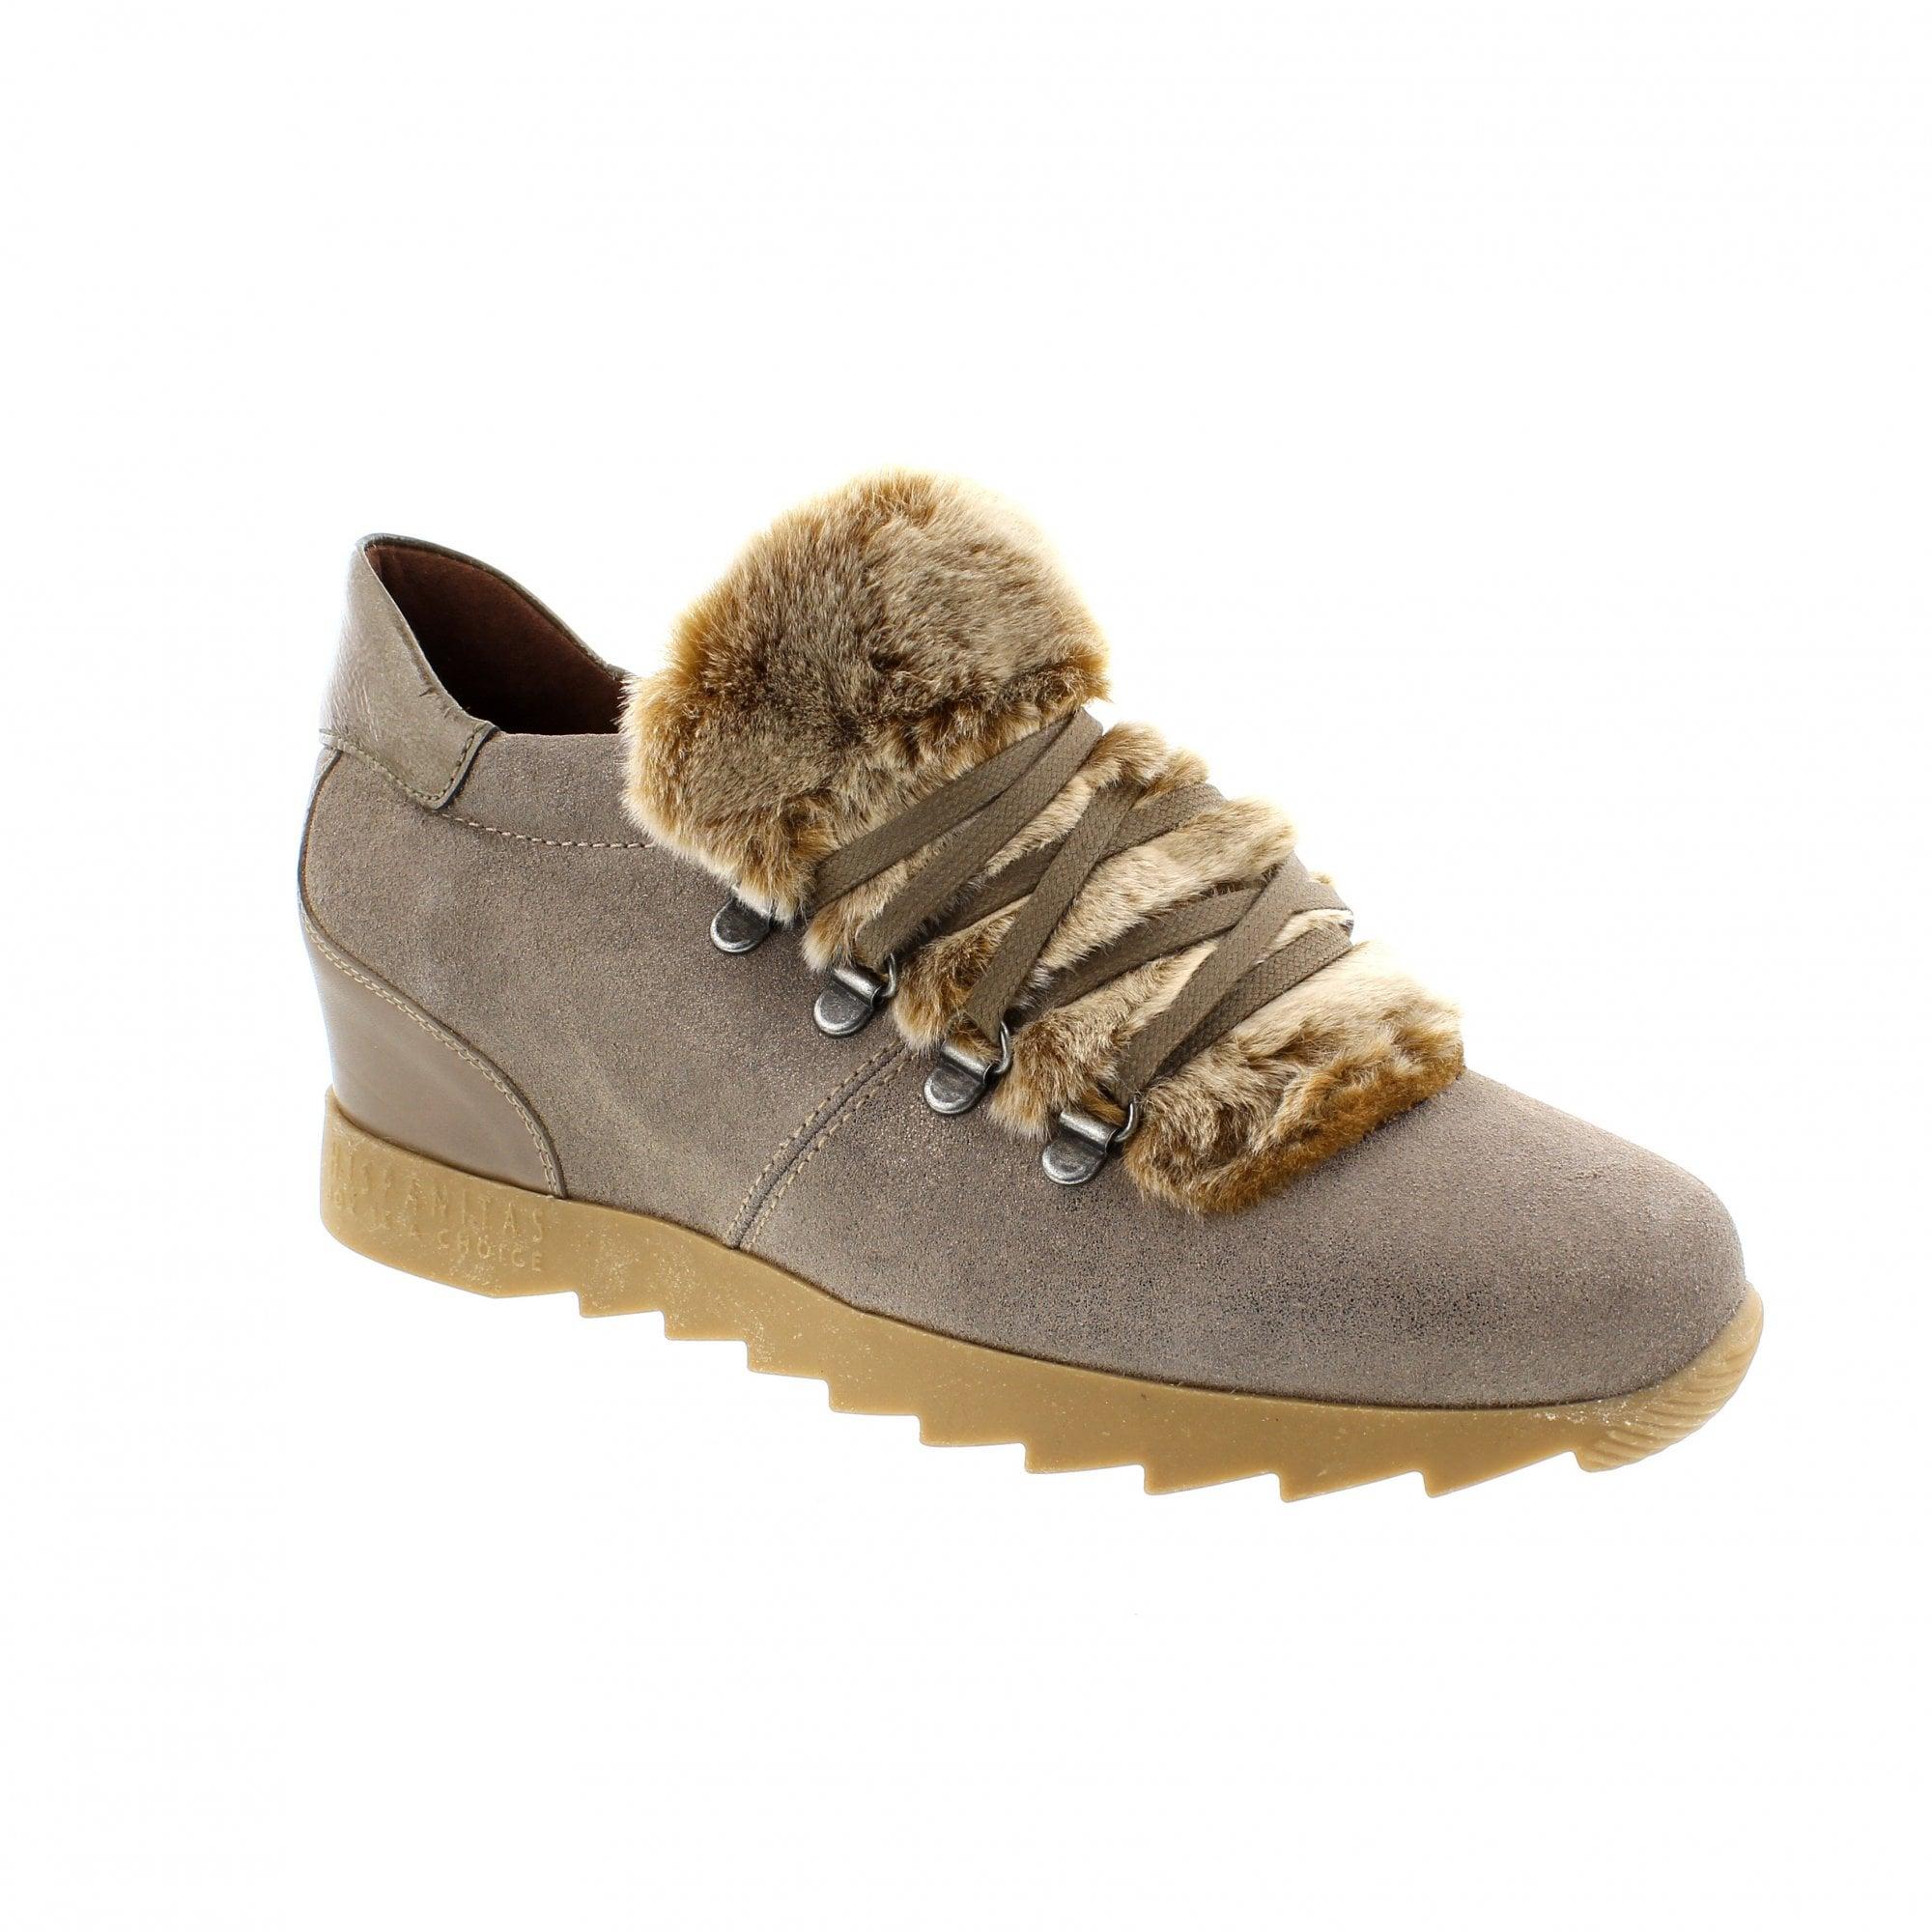 4e77a160ac697 Hispanitas Sesame 87380-v40 Womens Shoes | Rogerson Shoes